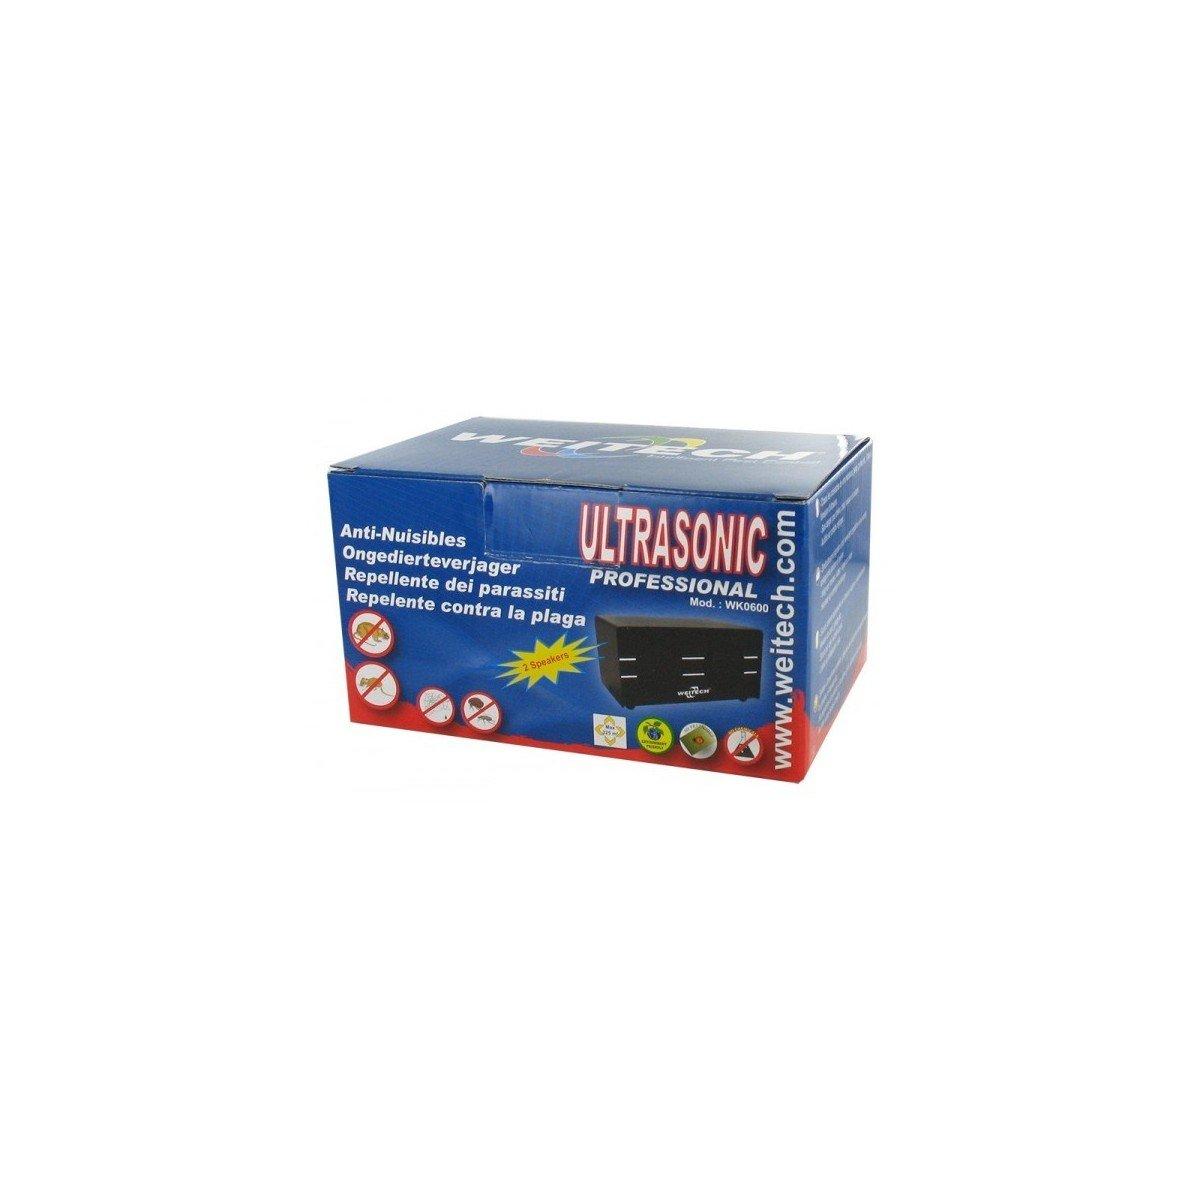 Weitech - Ultraschall Vertreiber professionnel WK0600